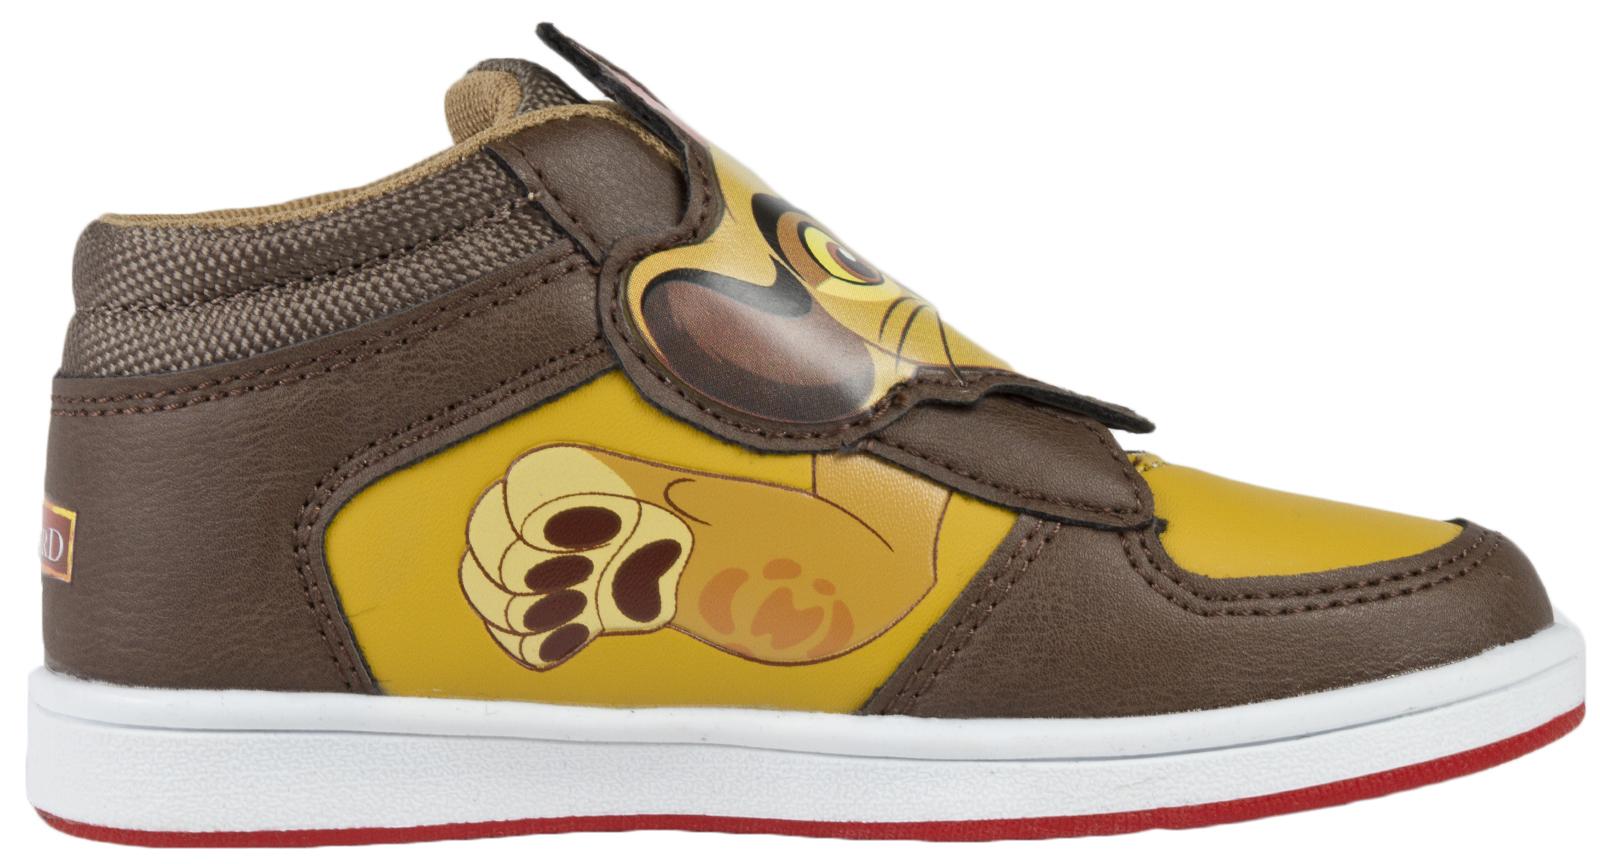 Disney-Lion-Guard-Trainers-Character-Sports-Shoes-Boys-Canvas-Pumps-Hi-Tops-Size